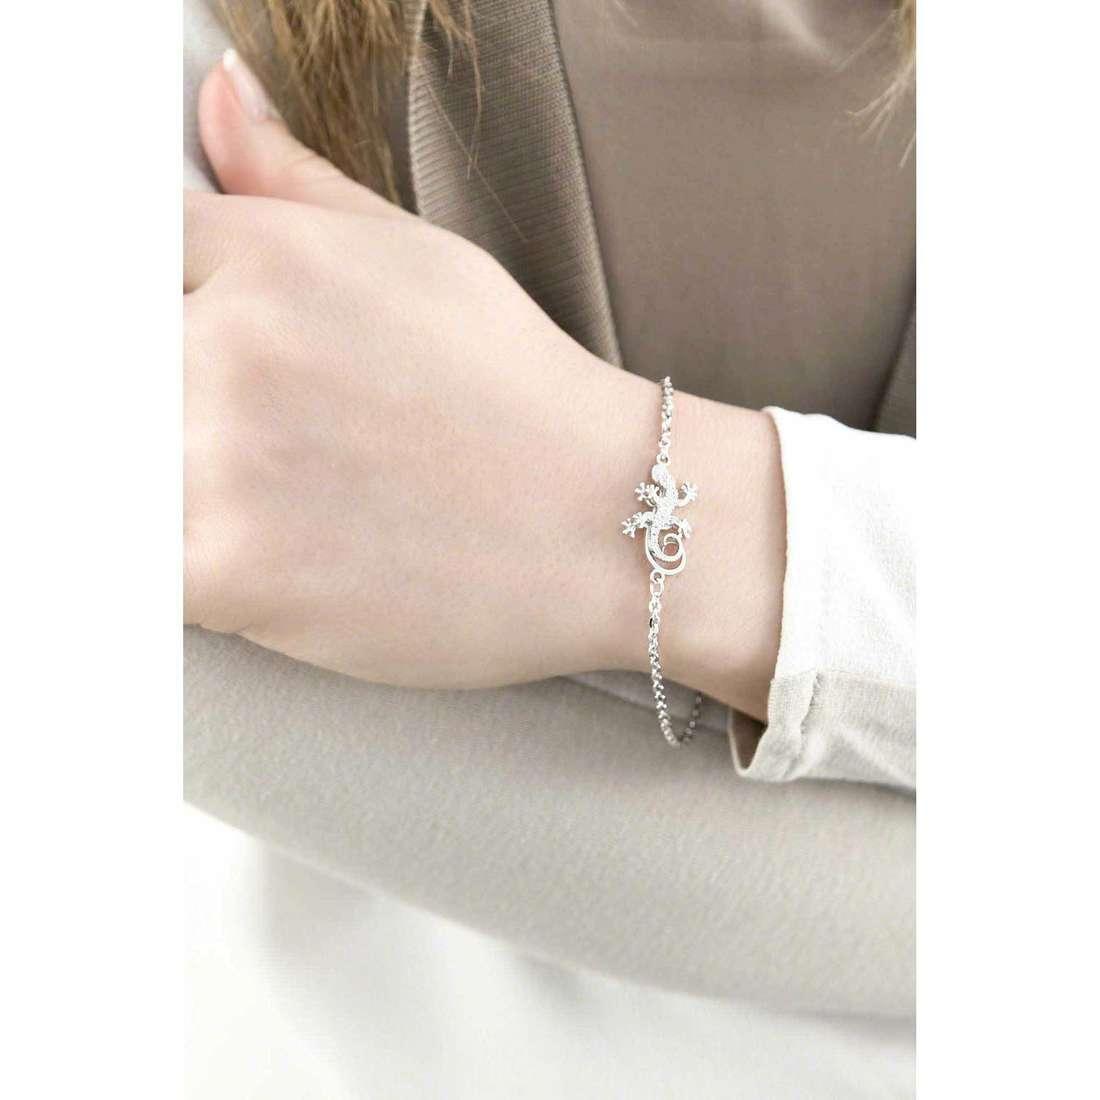 Giannotti bracelets Il Geco femme GIANNOTTIGEA103 indosso